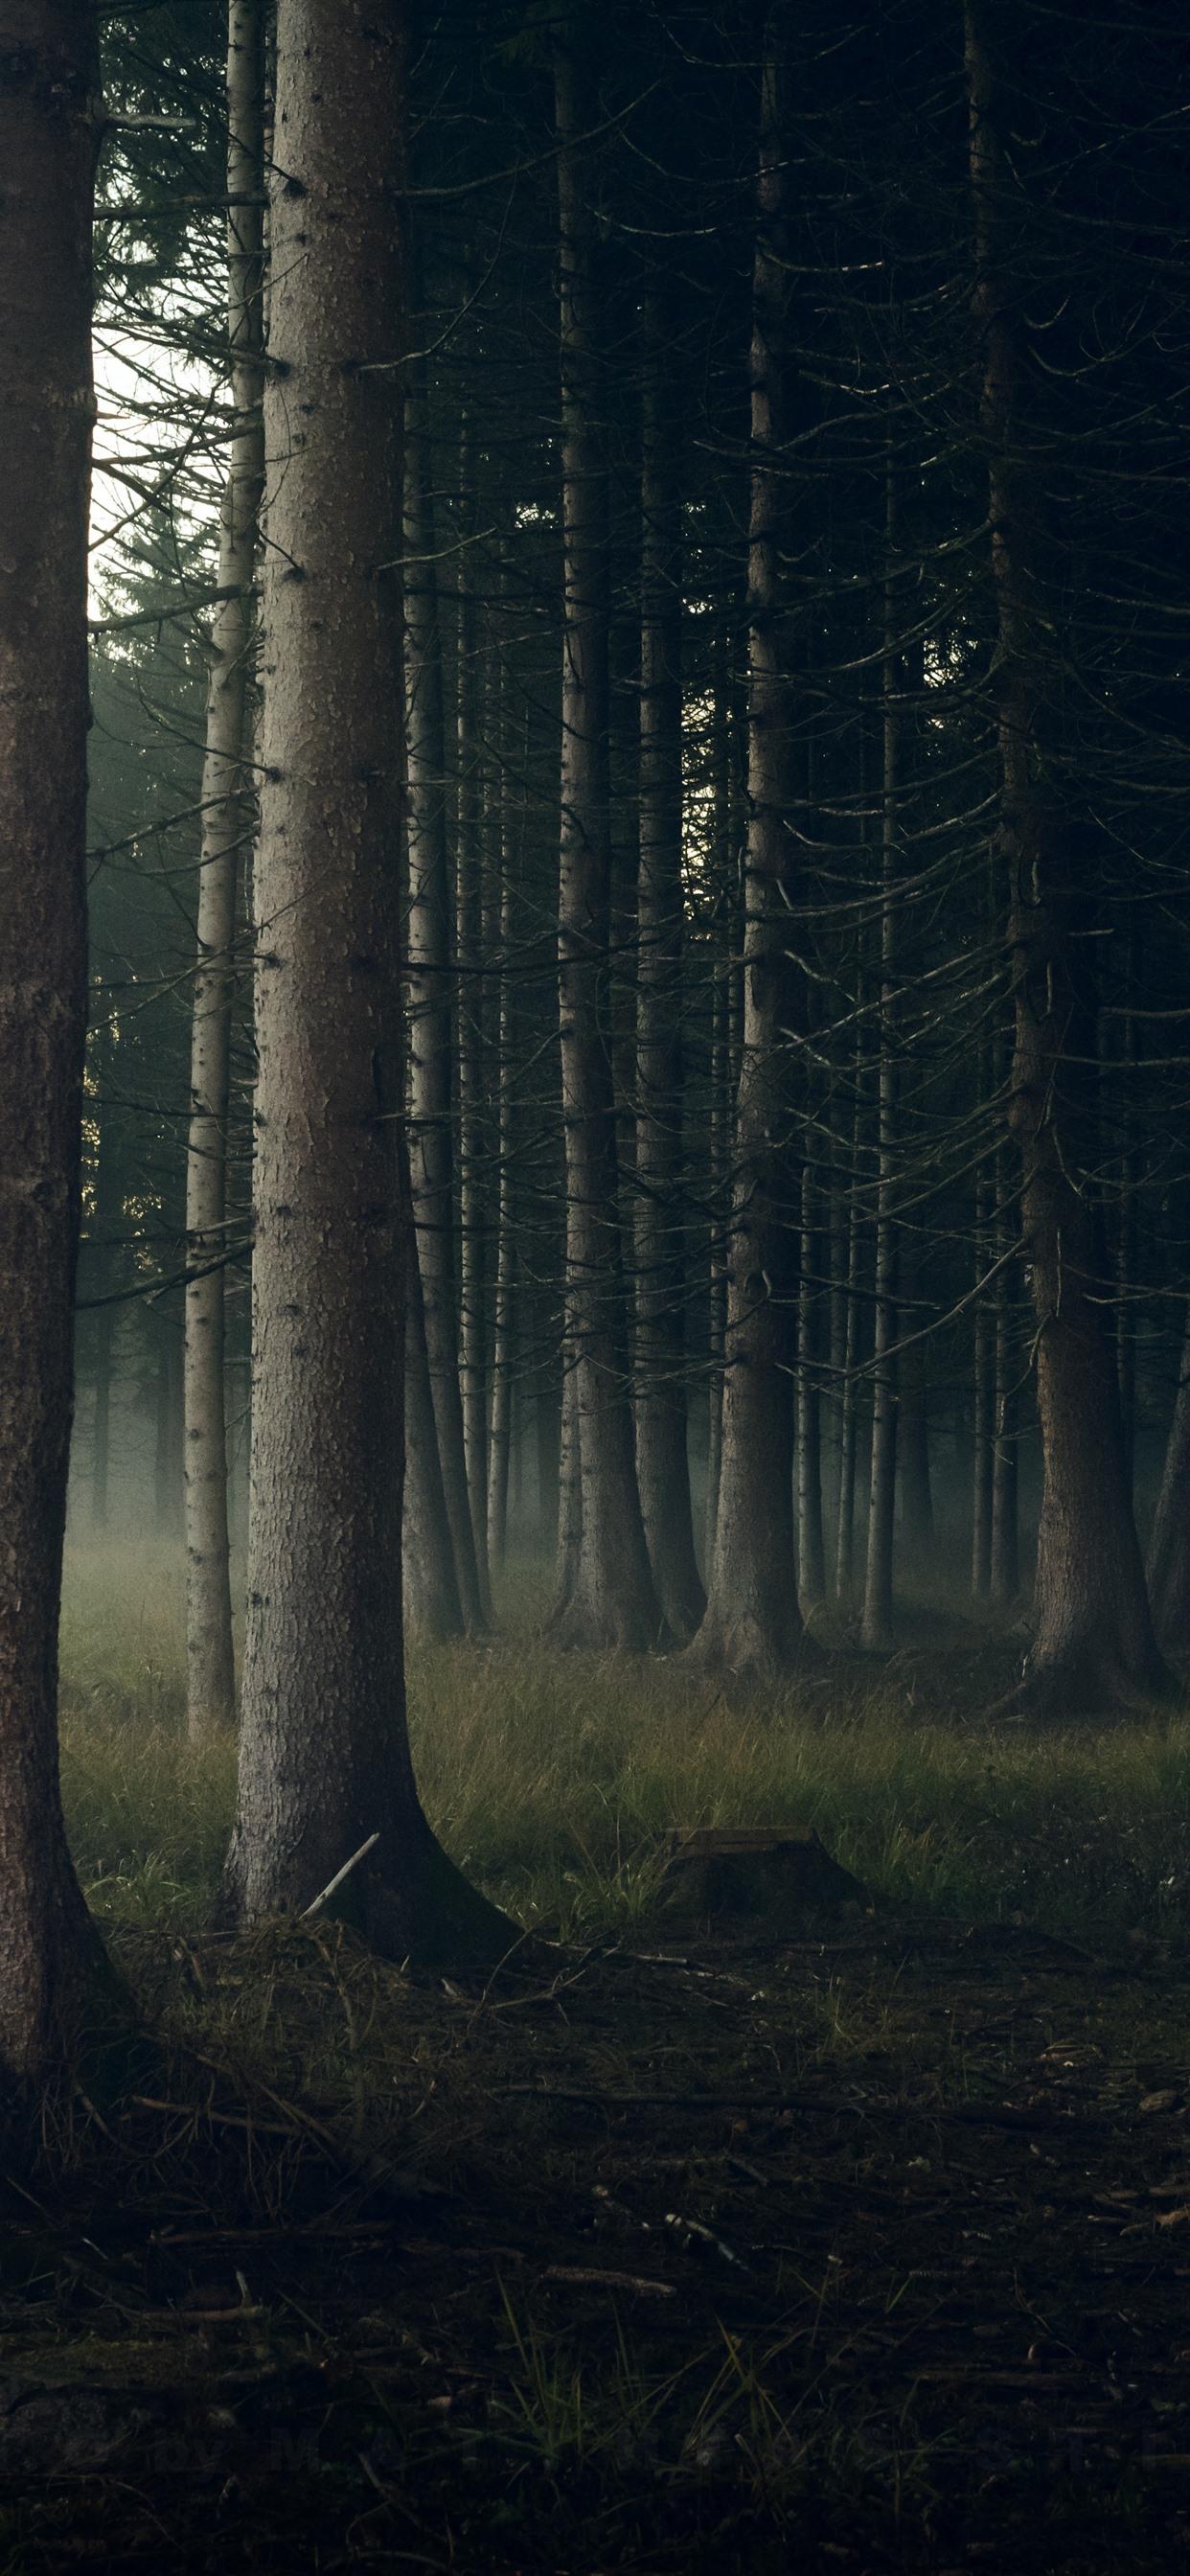 Trunks Iphone Wallpaper - Iphone Xs Max Wallpaper Forest , HD Wallpaper & Backgrounds